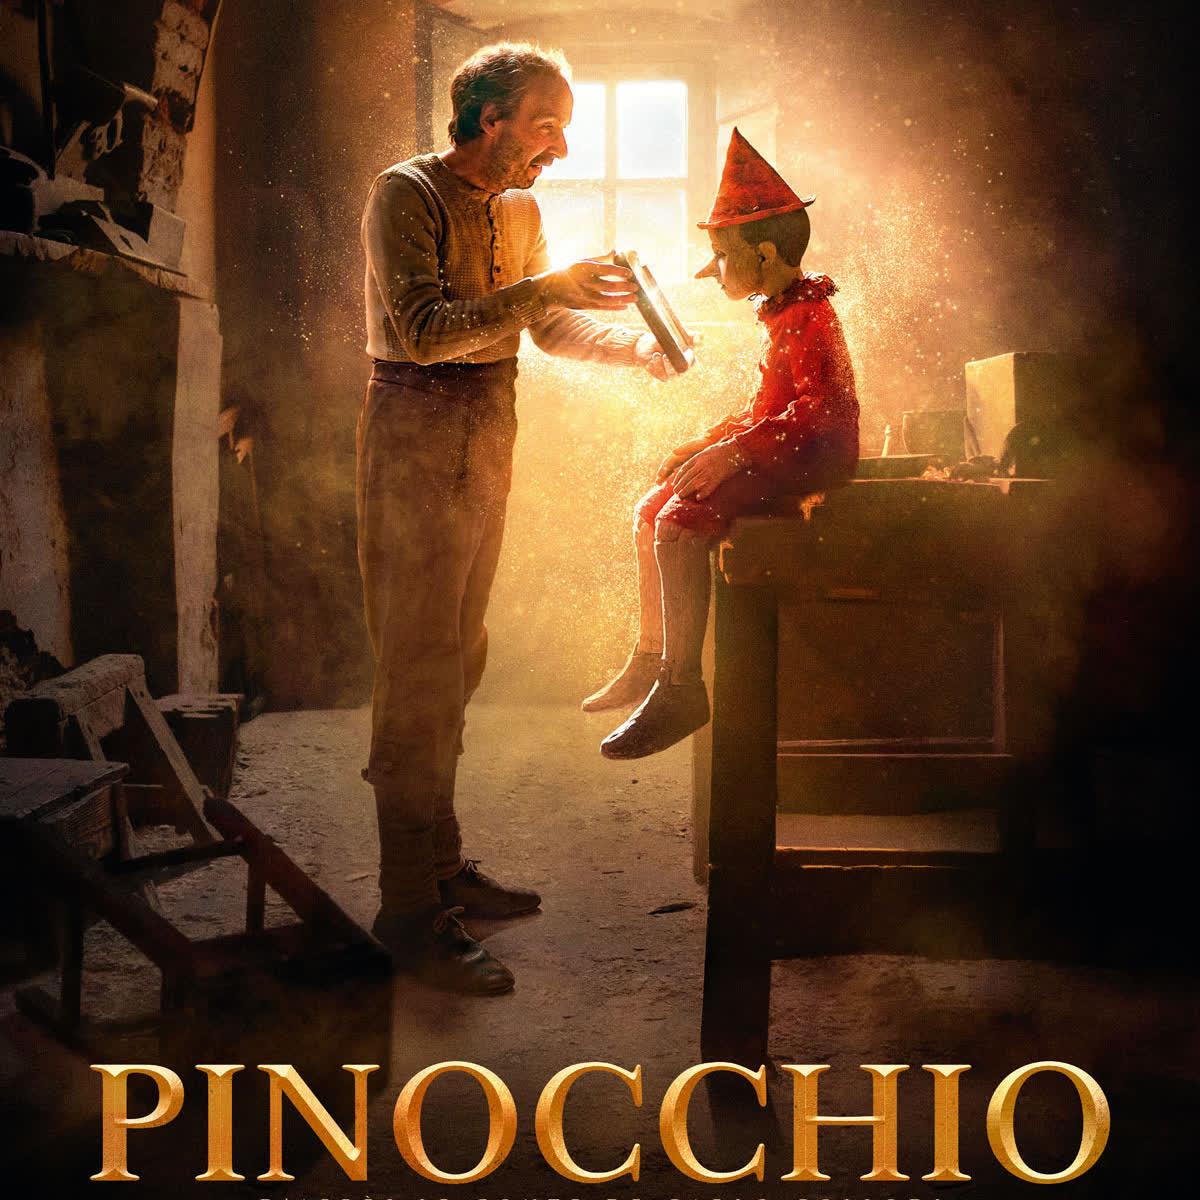 Pinocchio 2019 نقد و بررسی فیلم